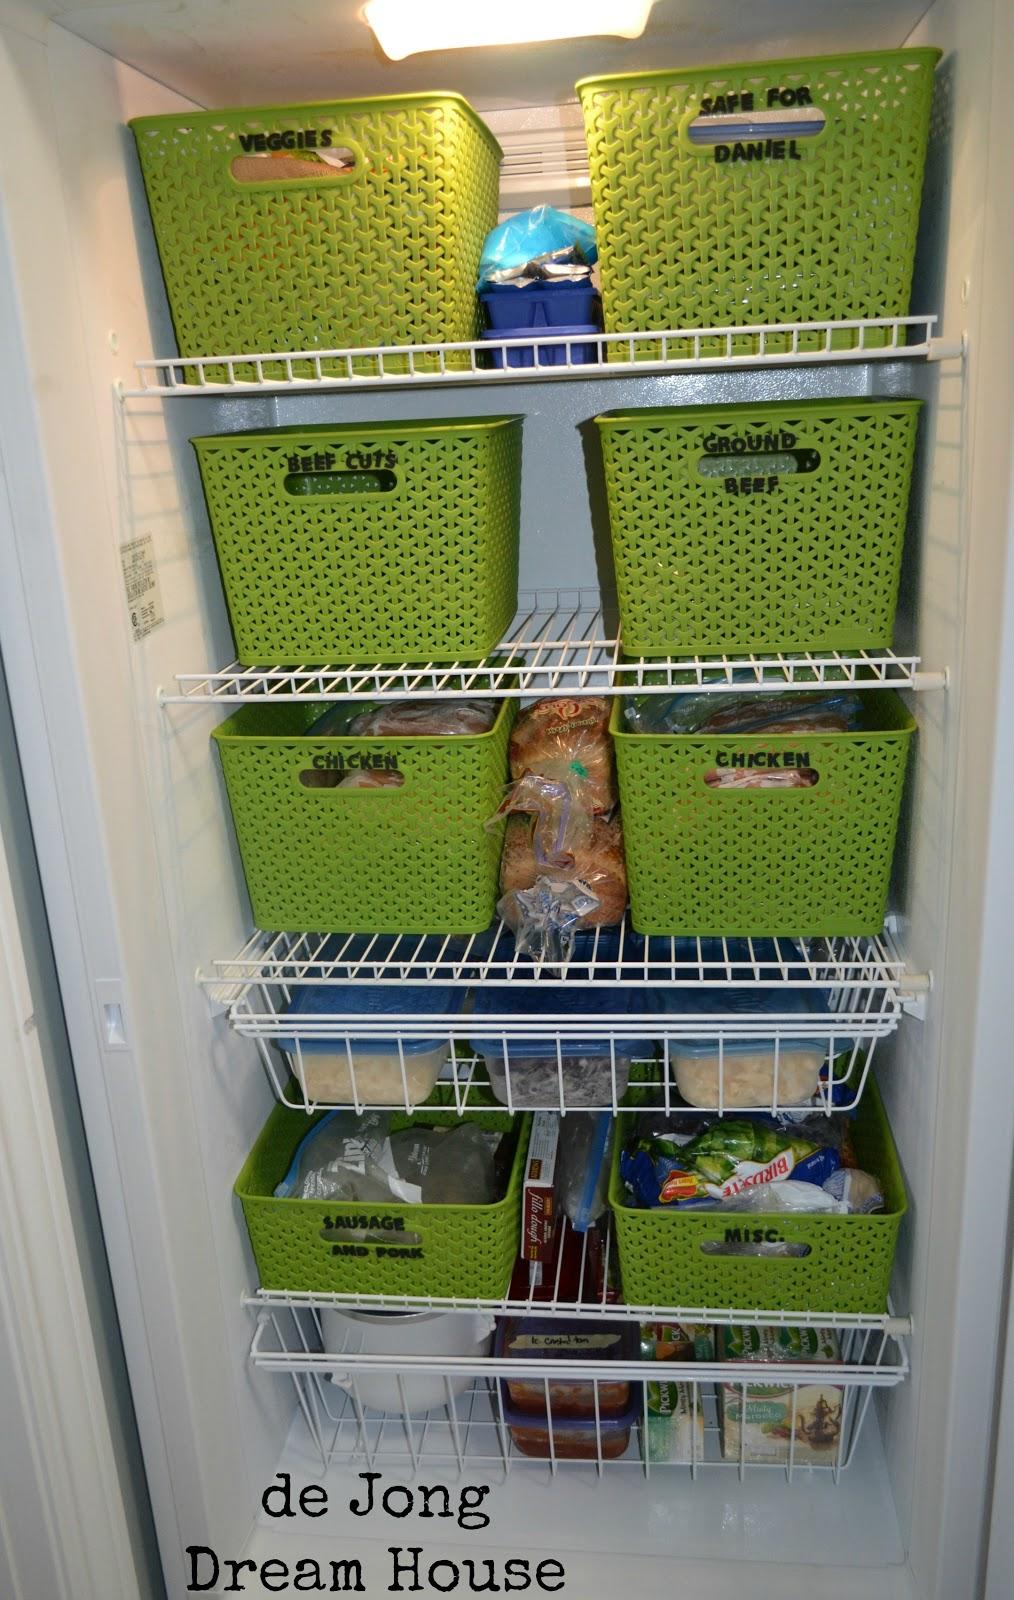 De Jong Dream House Organizing The Freezer